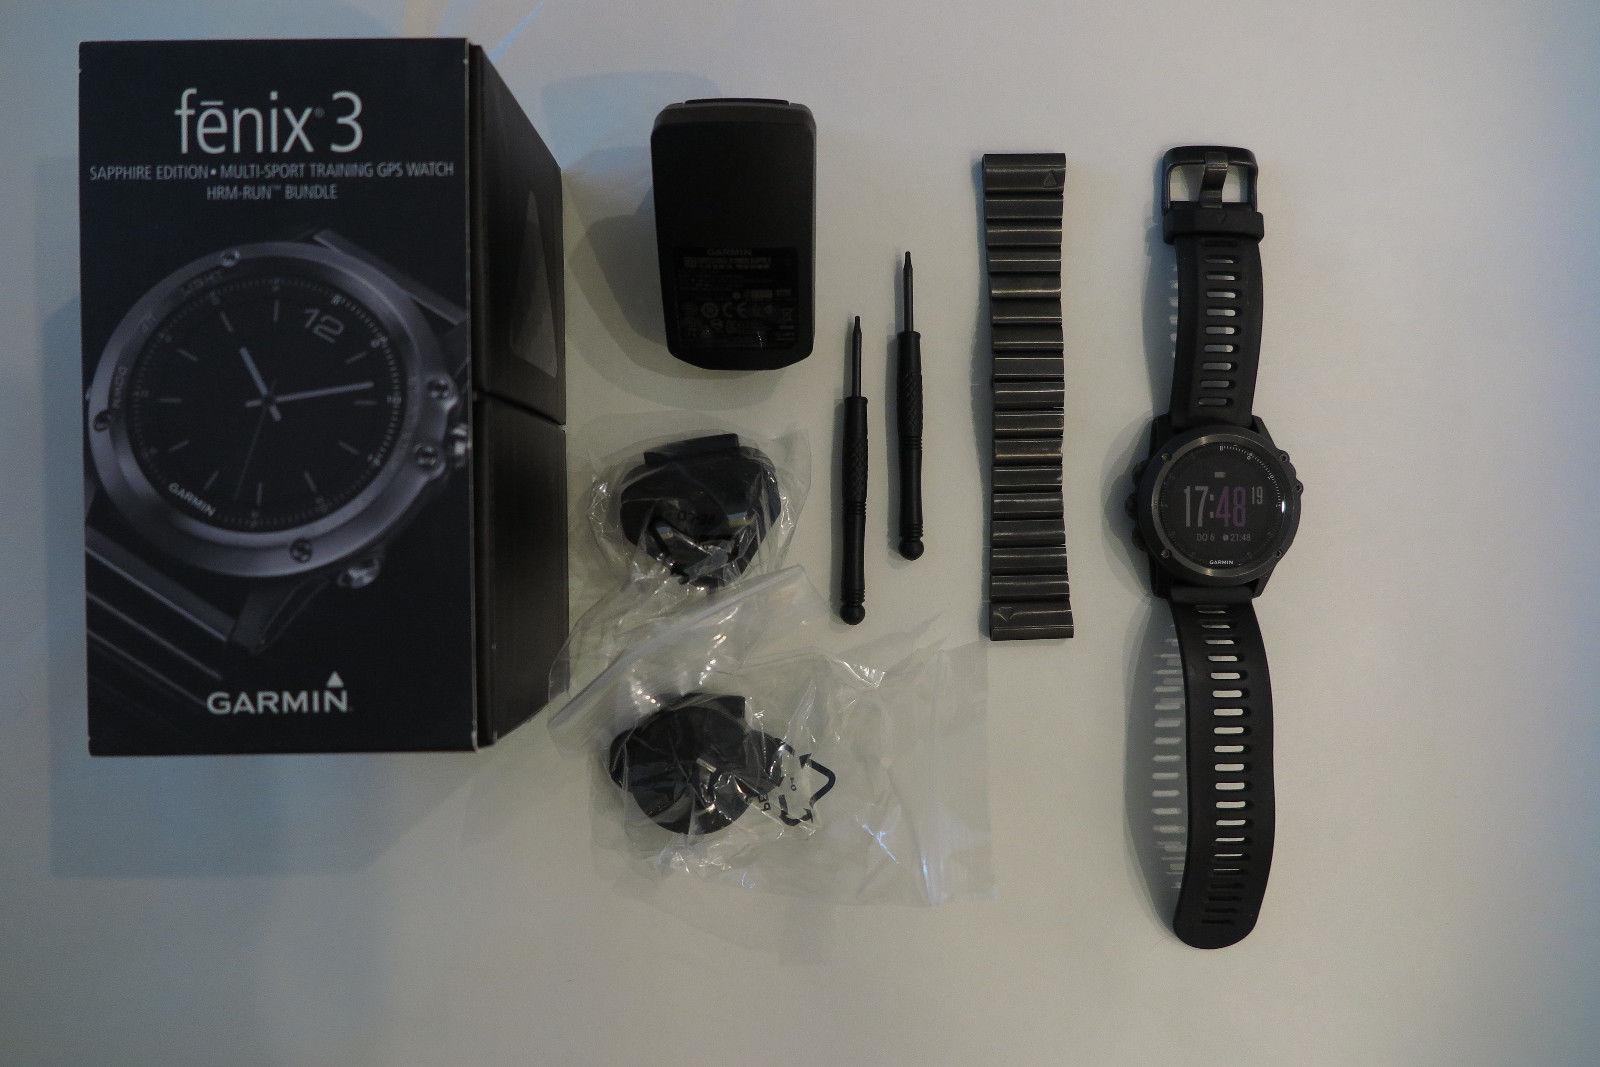 Garmin Fenix 3 Saphir, GPS Sport Uhr, Edelstahl- u Gummiarmband, Restgarantie